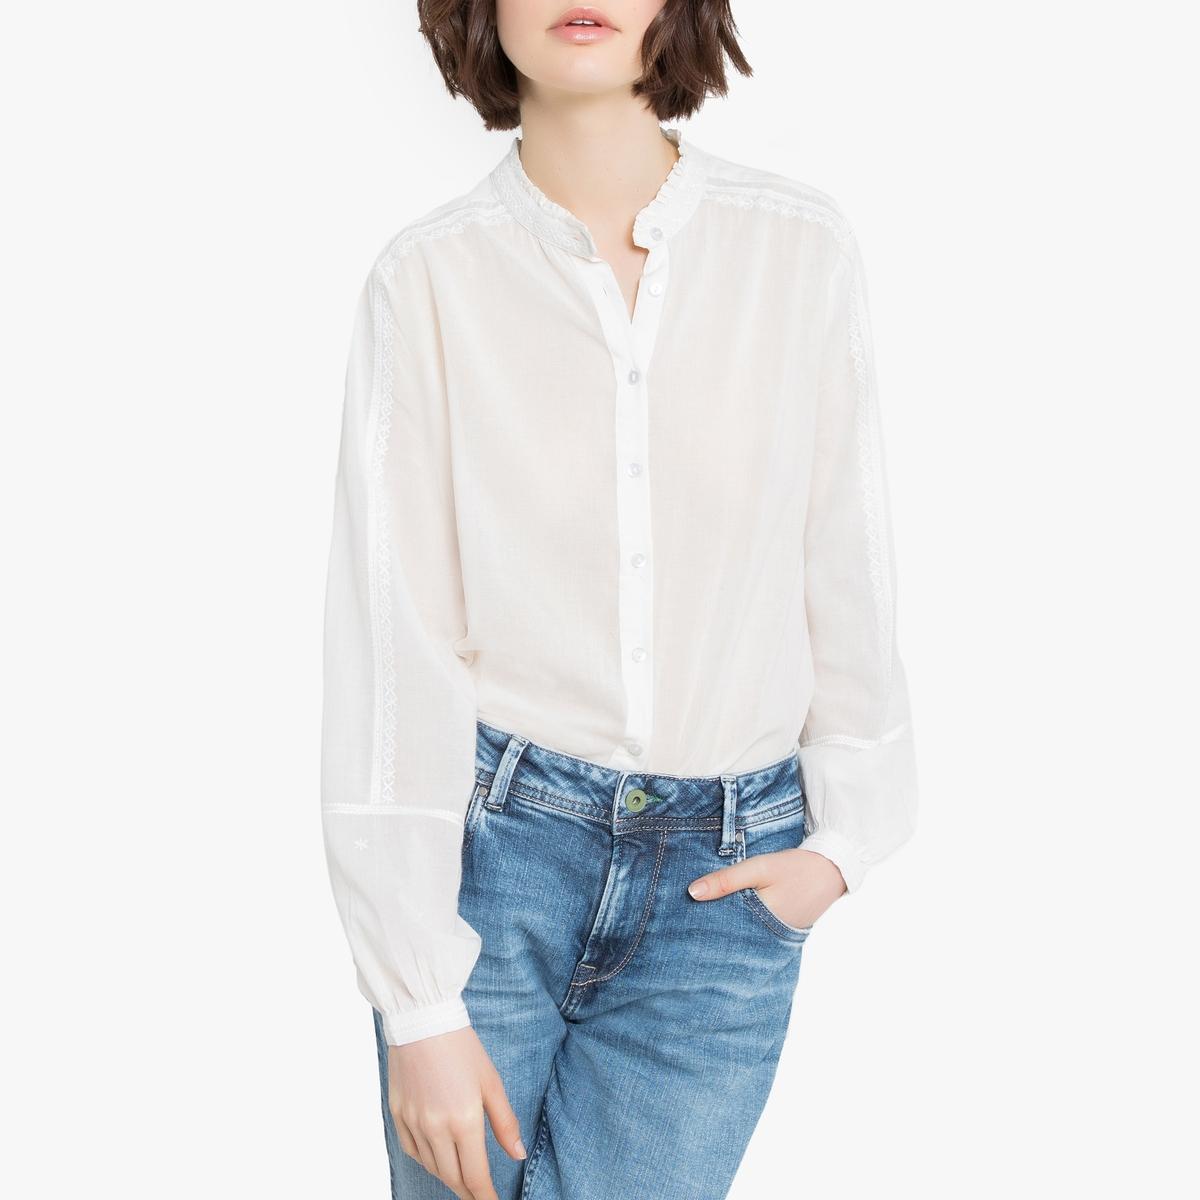 Blusa de cuello alto